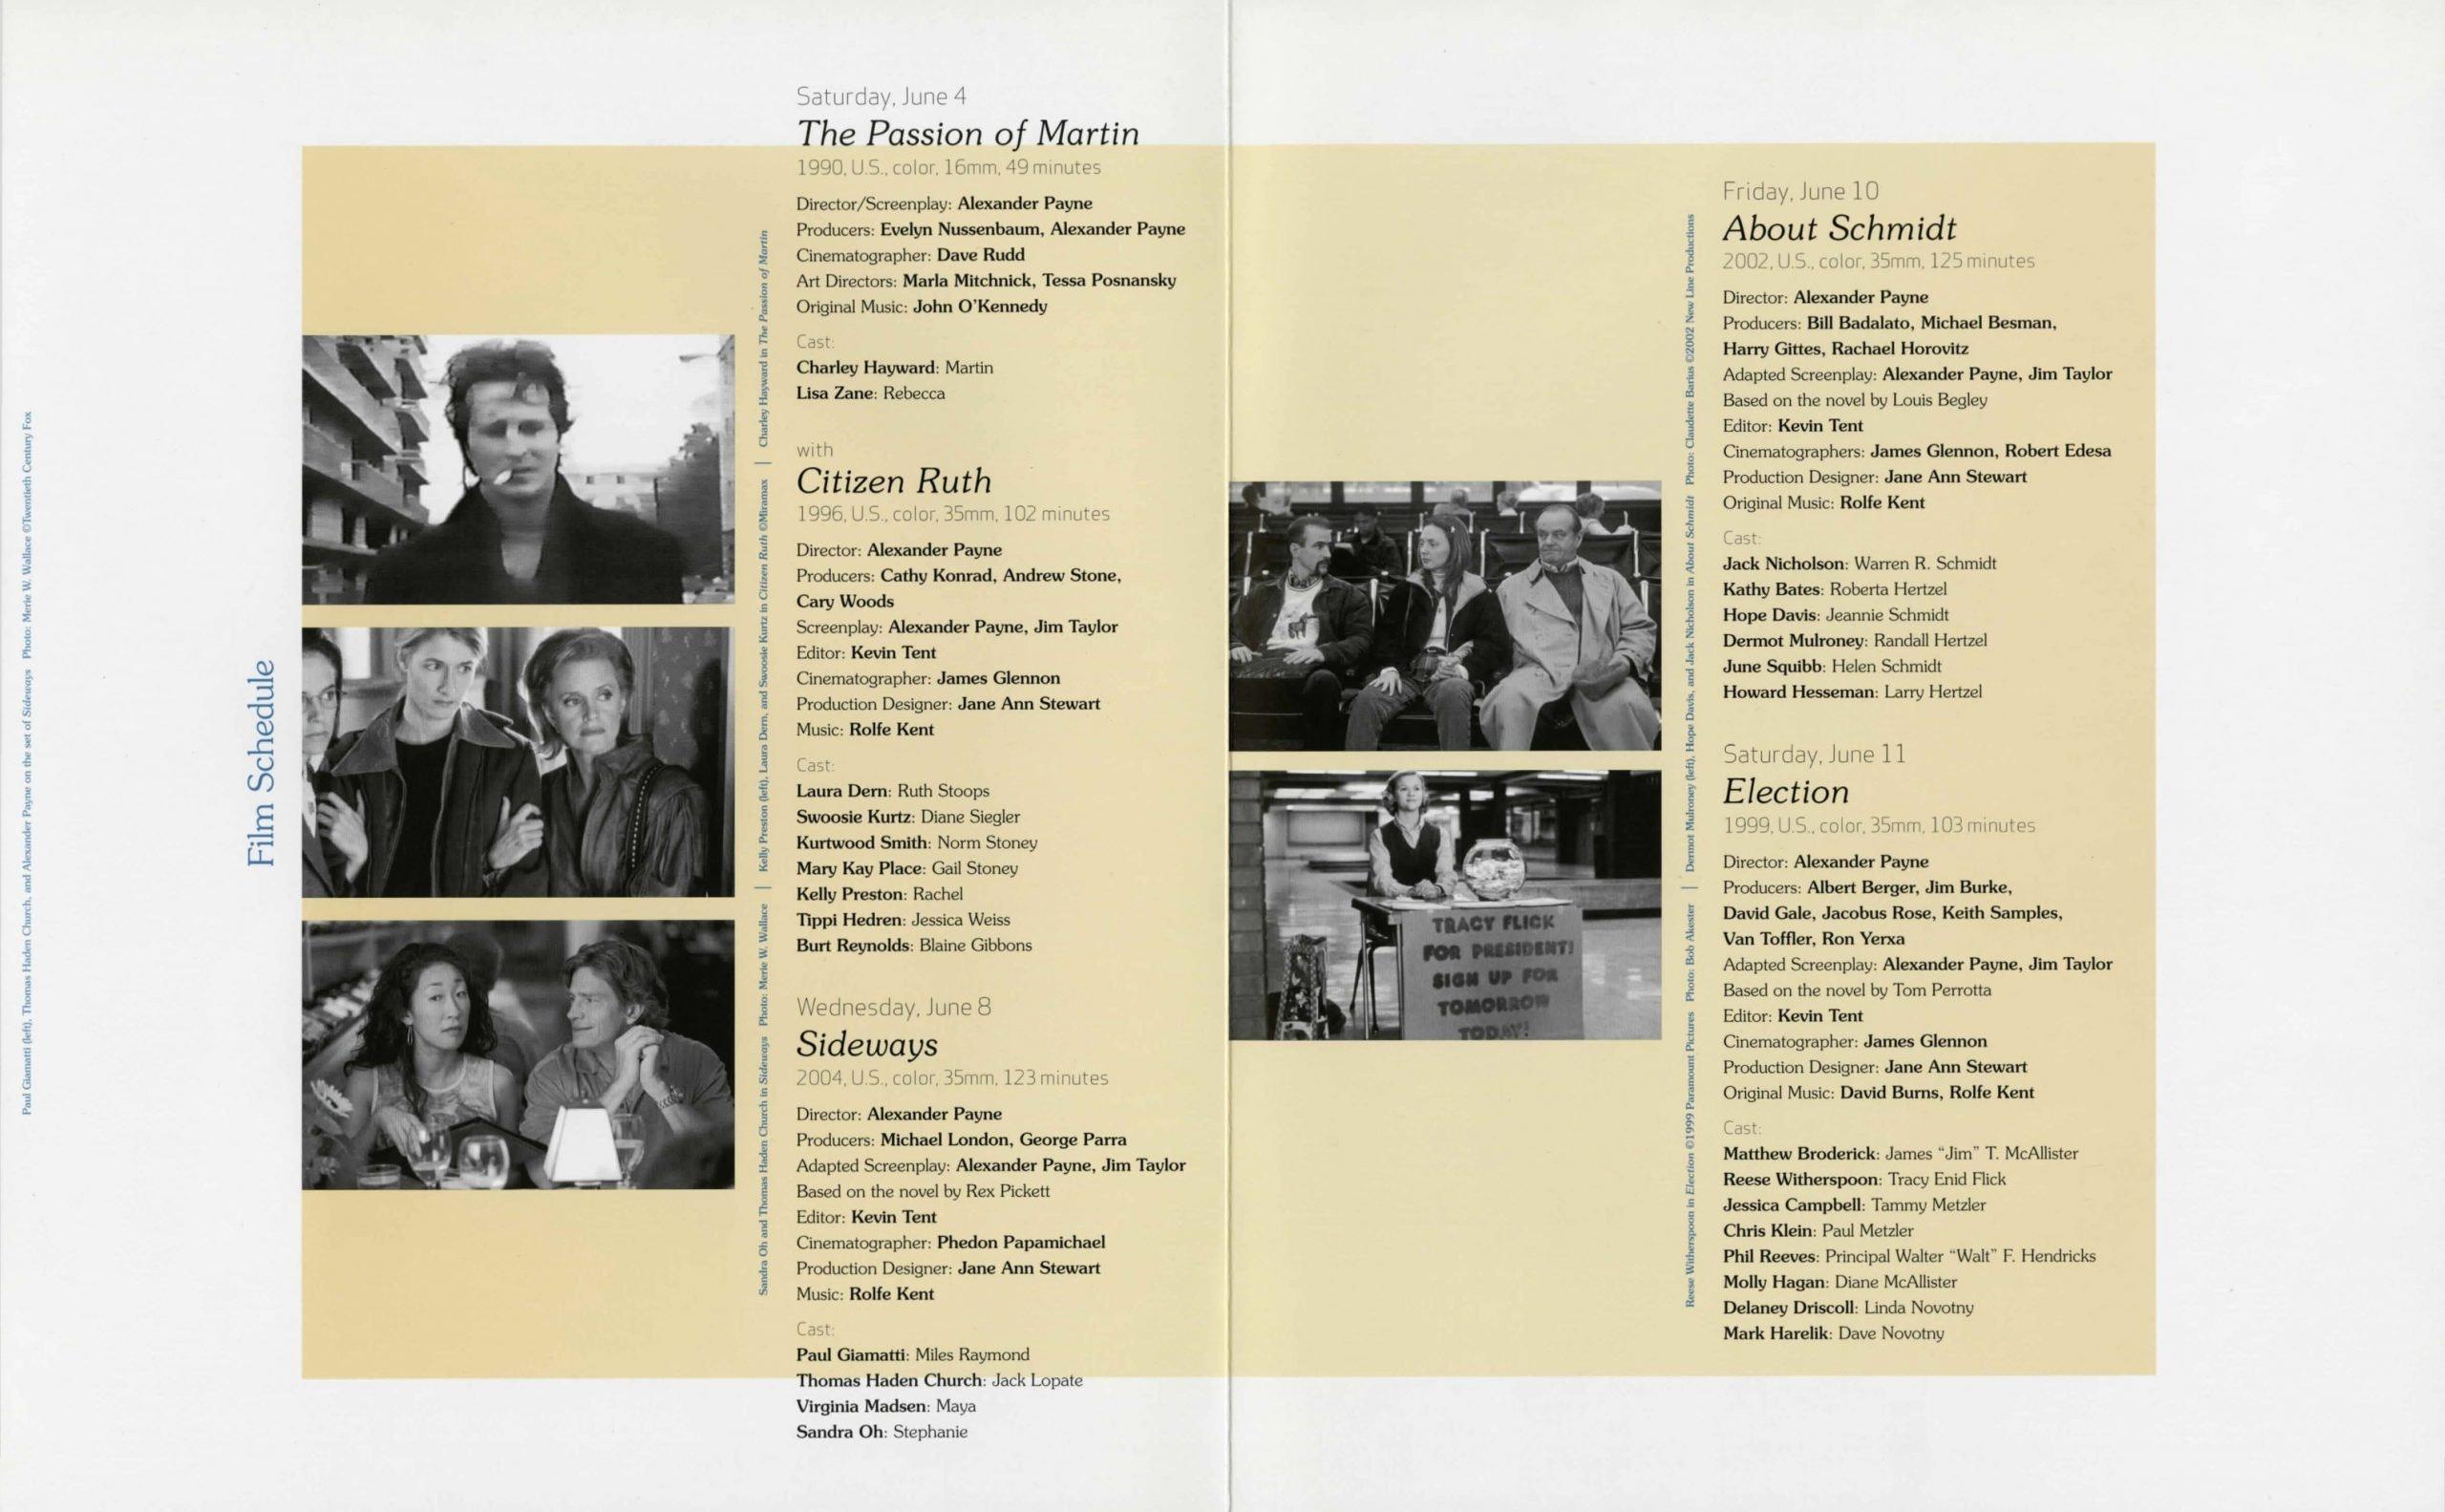 Alexander Payne Dialogue event brochure page 4